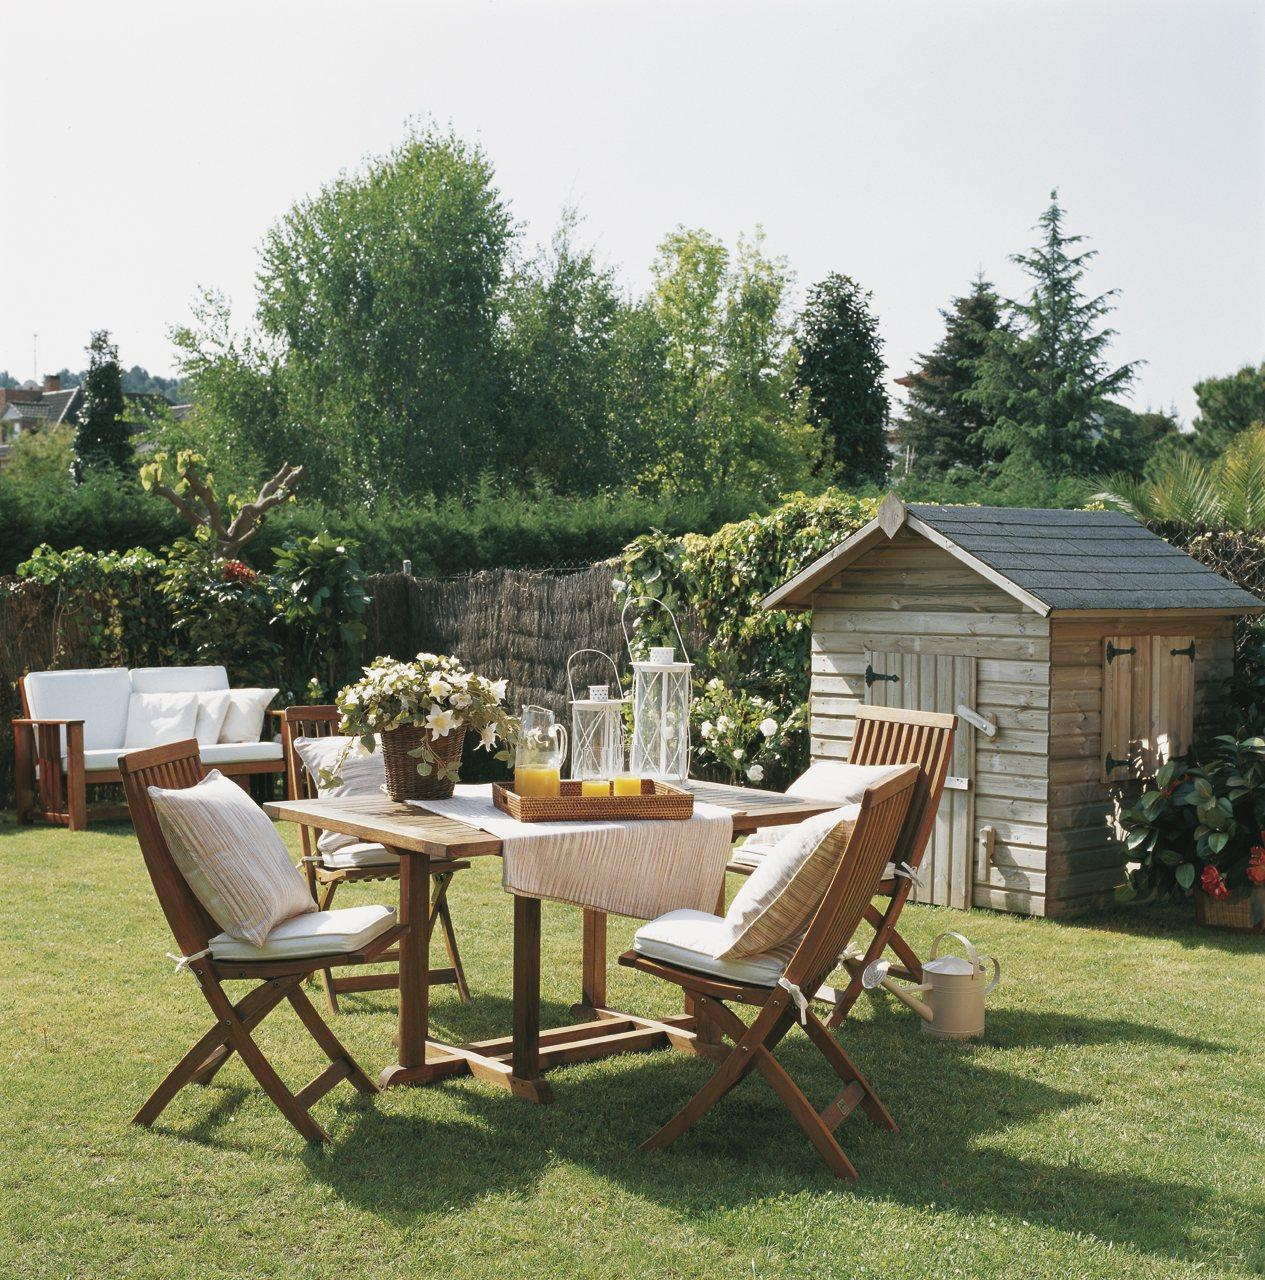 Otthon vid ken for Comedores de jardin baratos